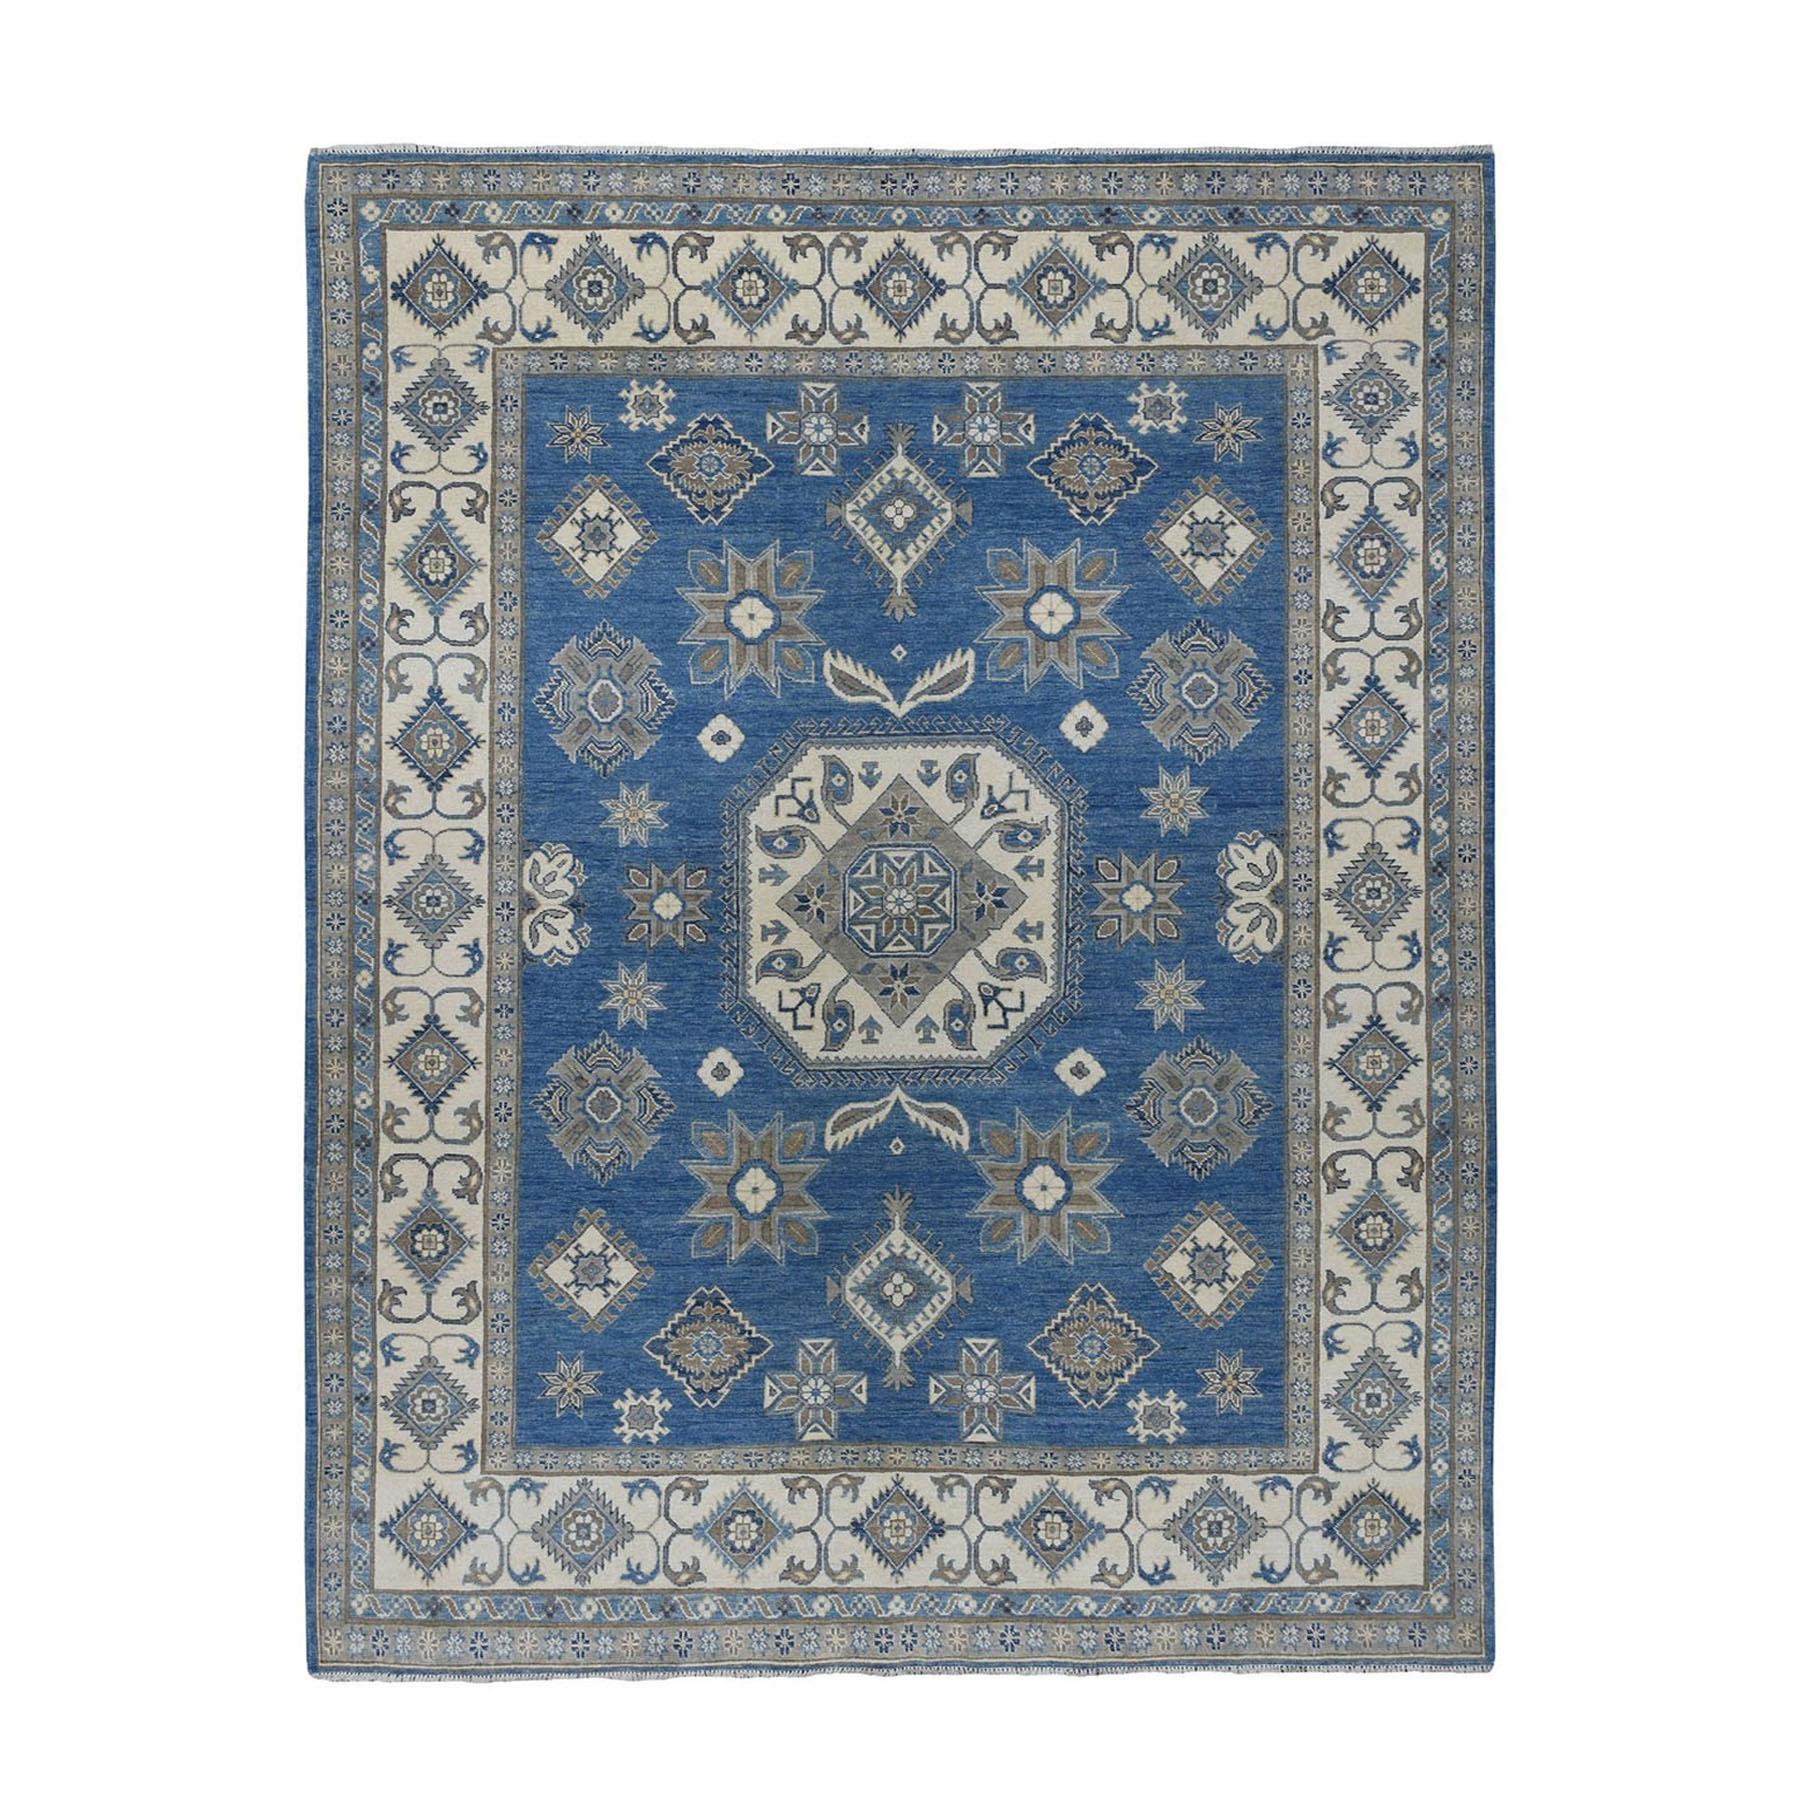 "8'X9'10"" Blue Vintage Look Kazak Geometric Design Hand-Knotted Oriental Rug moae076e"